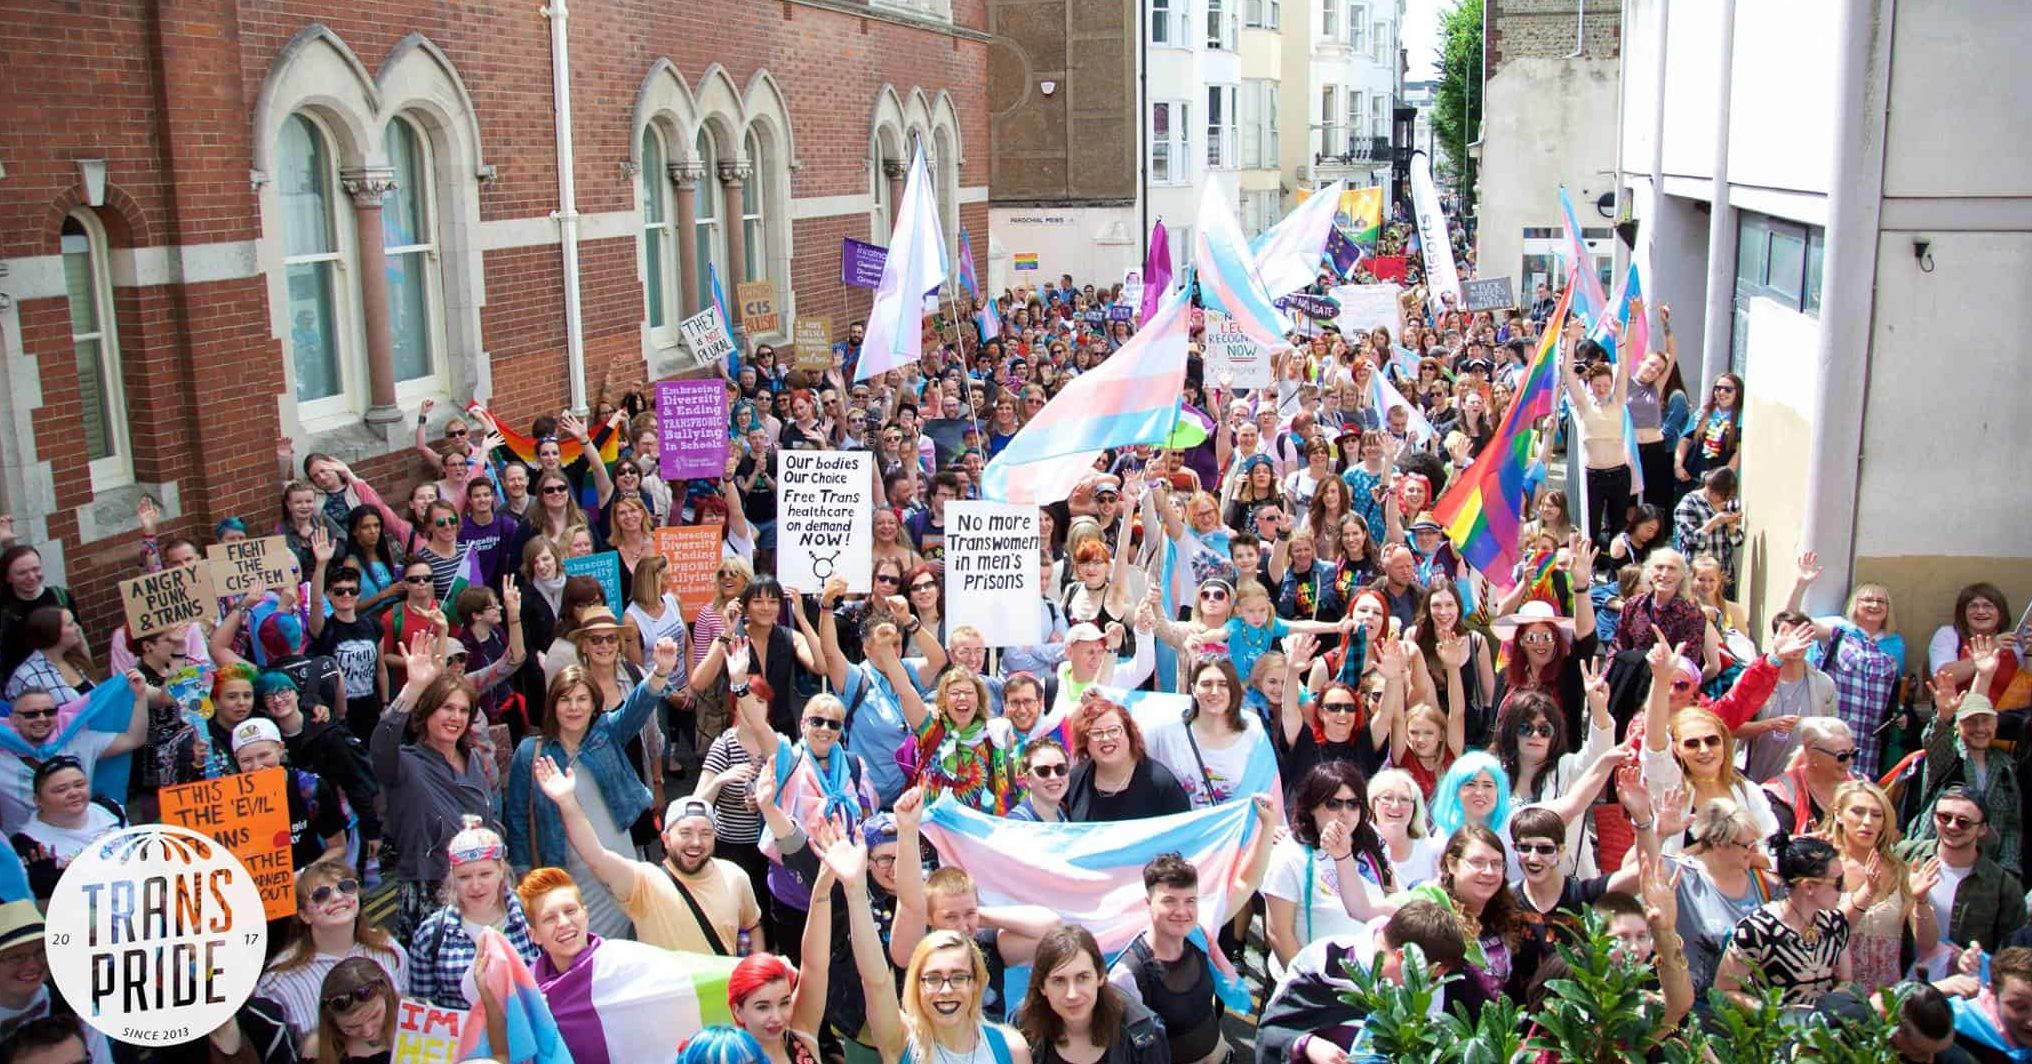 Brighton Trans Pride 2022